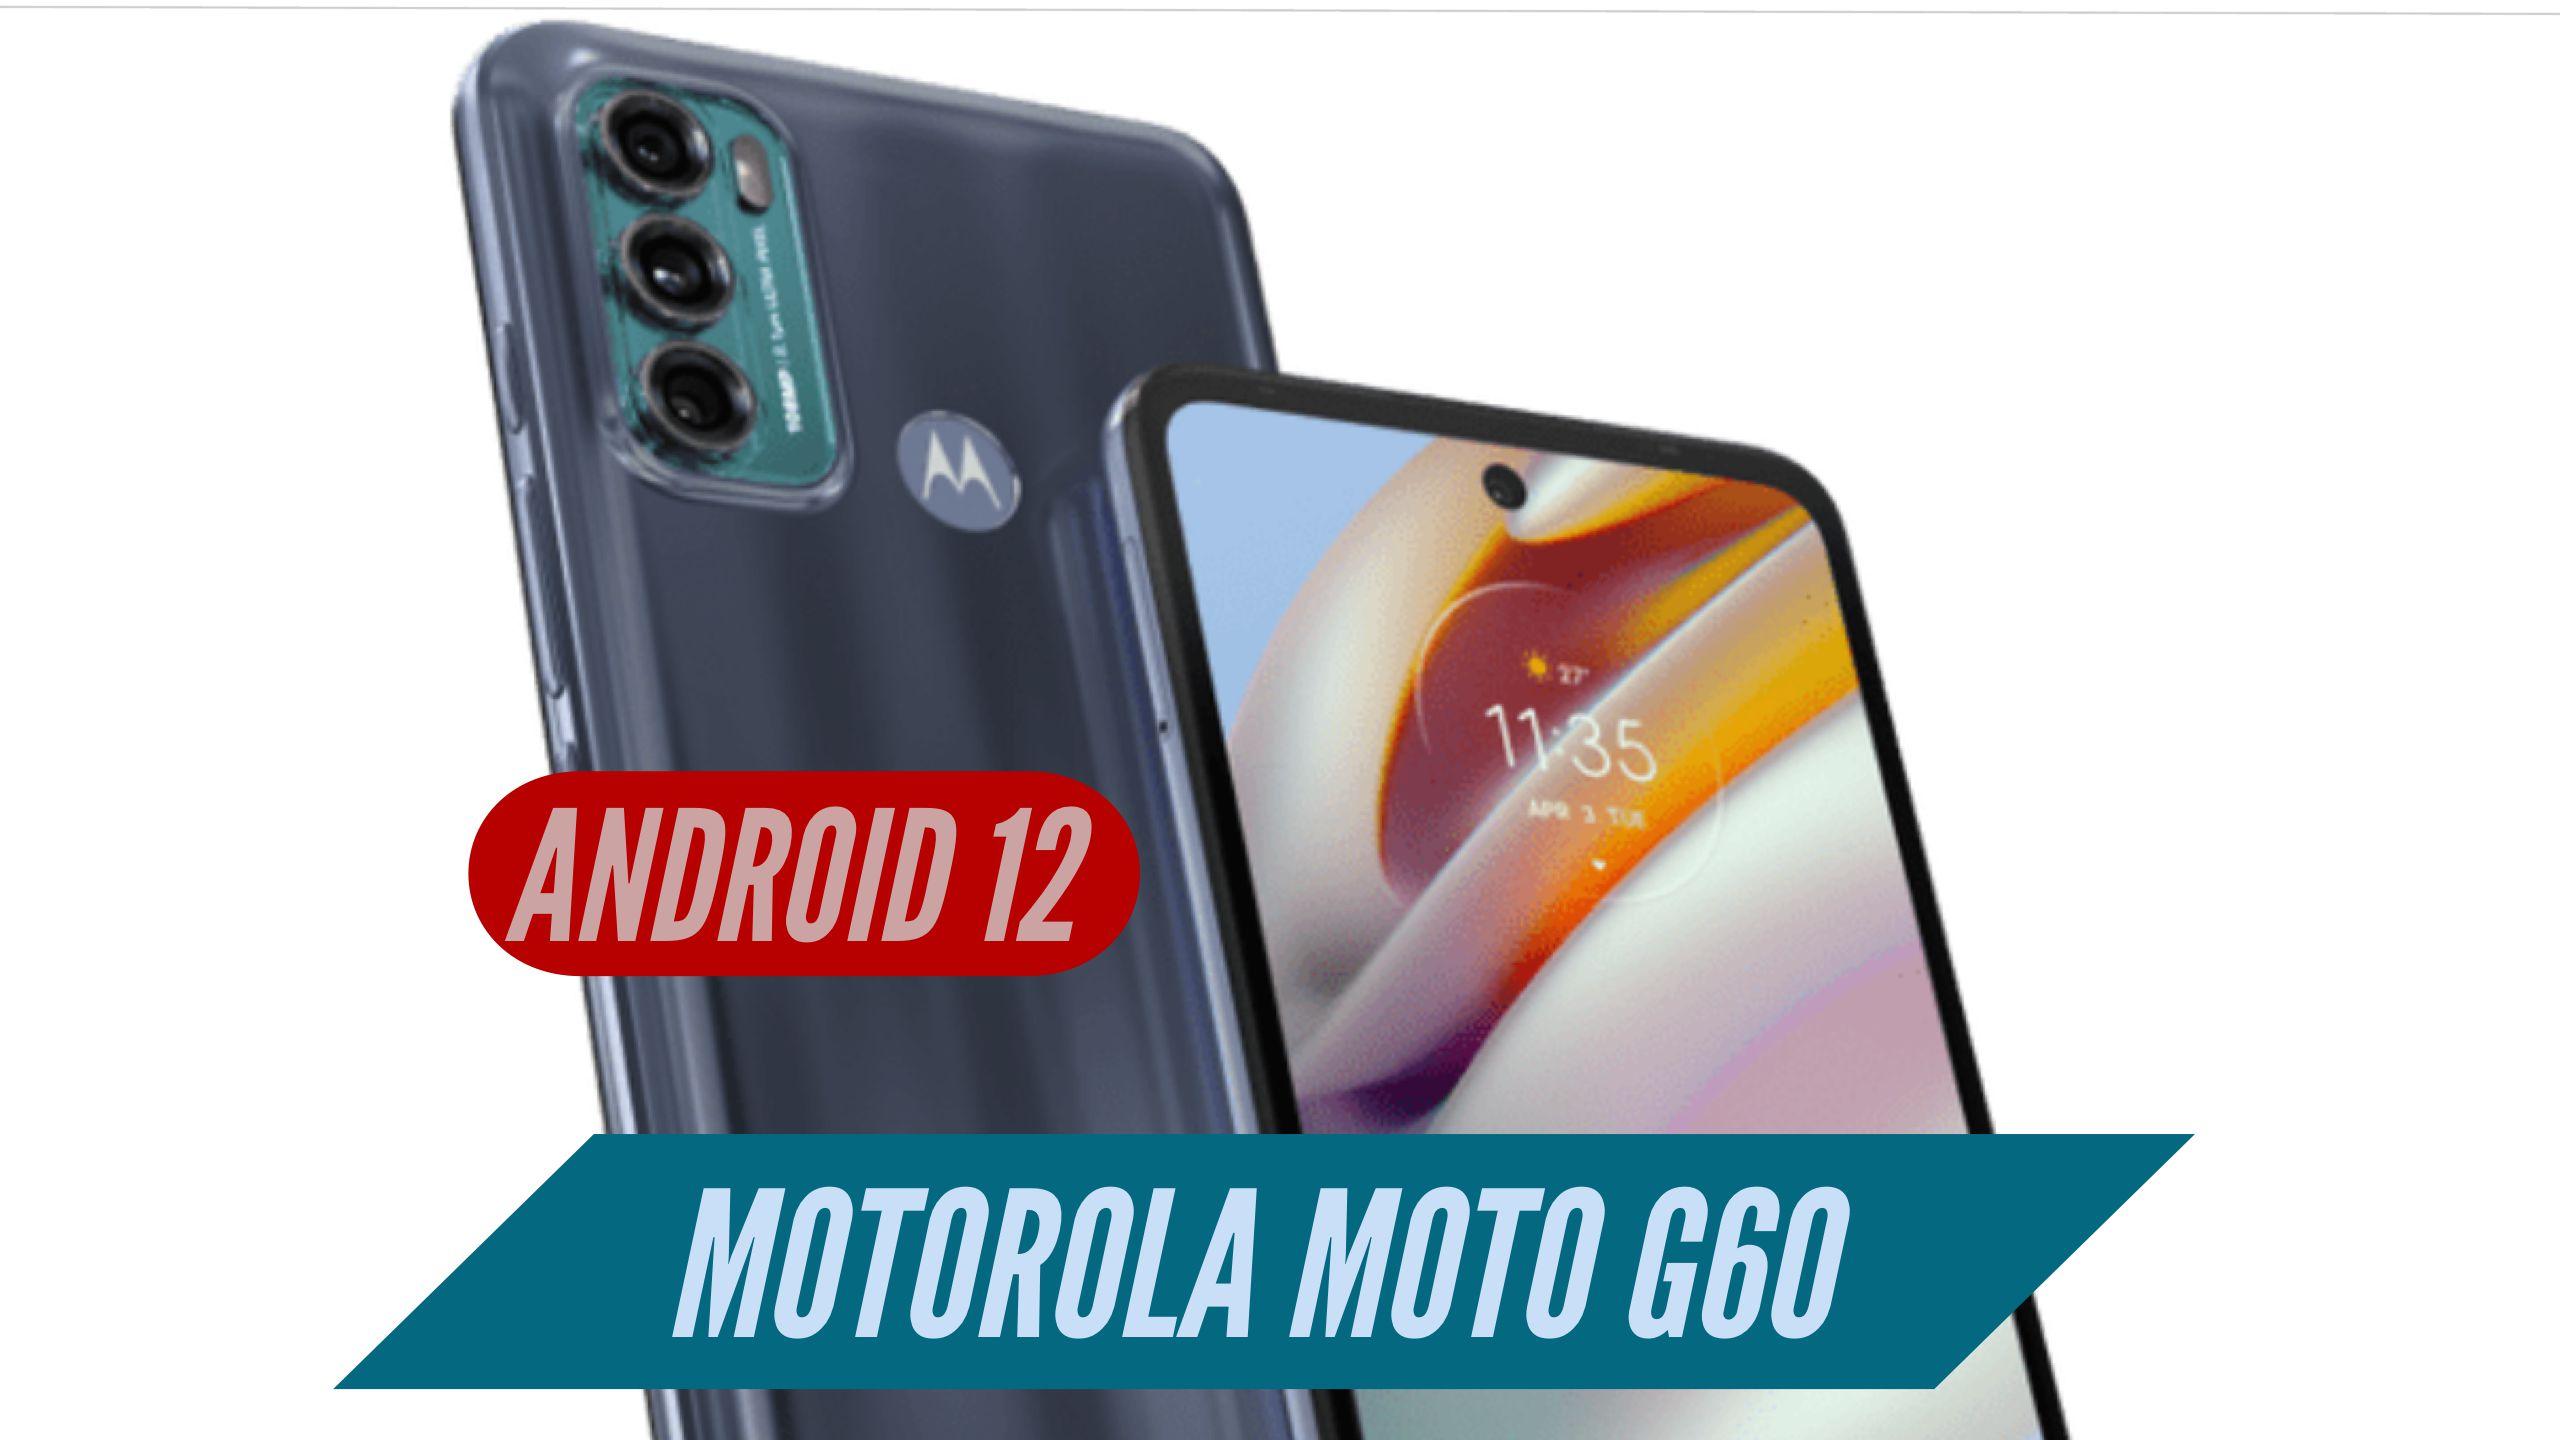 Motorola Moto G60 Android 12